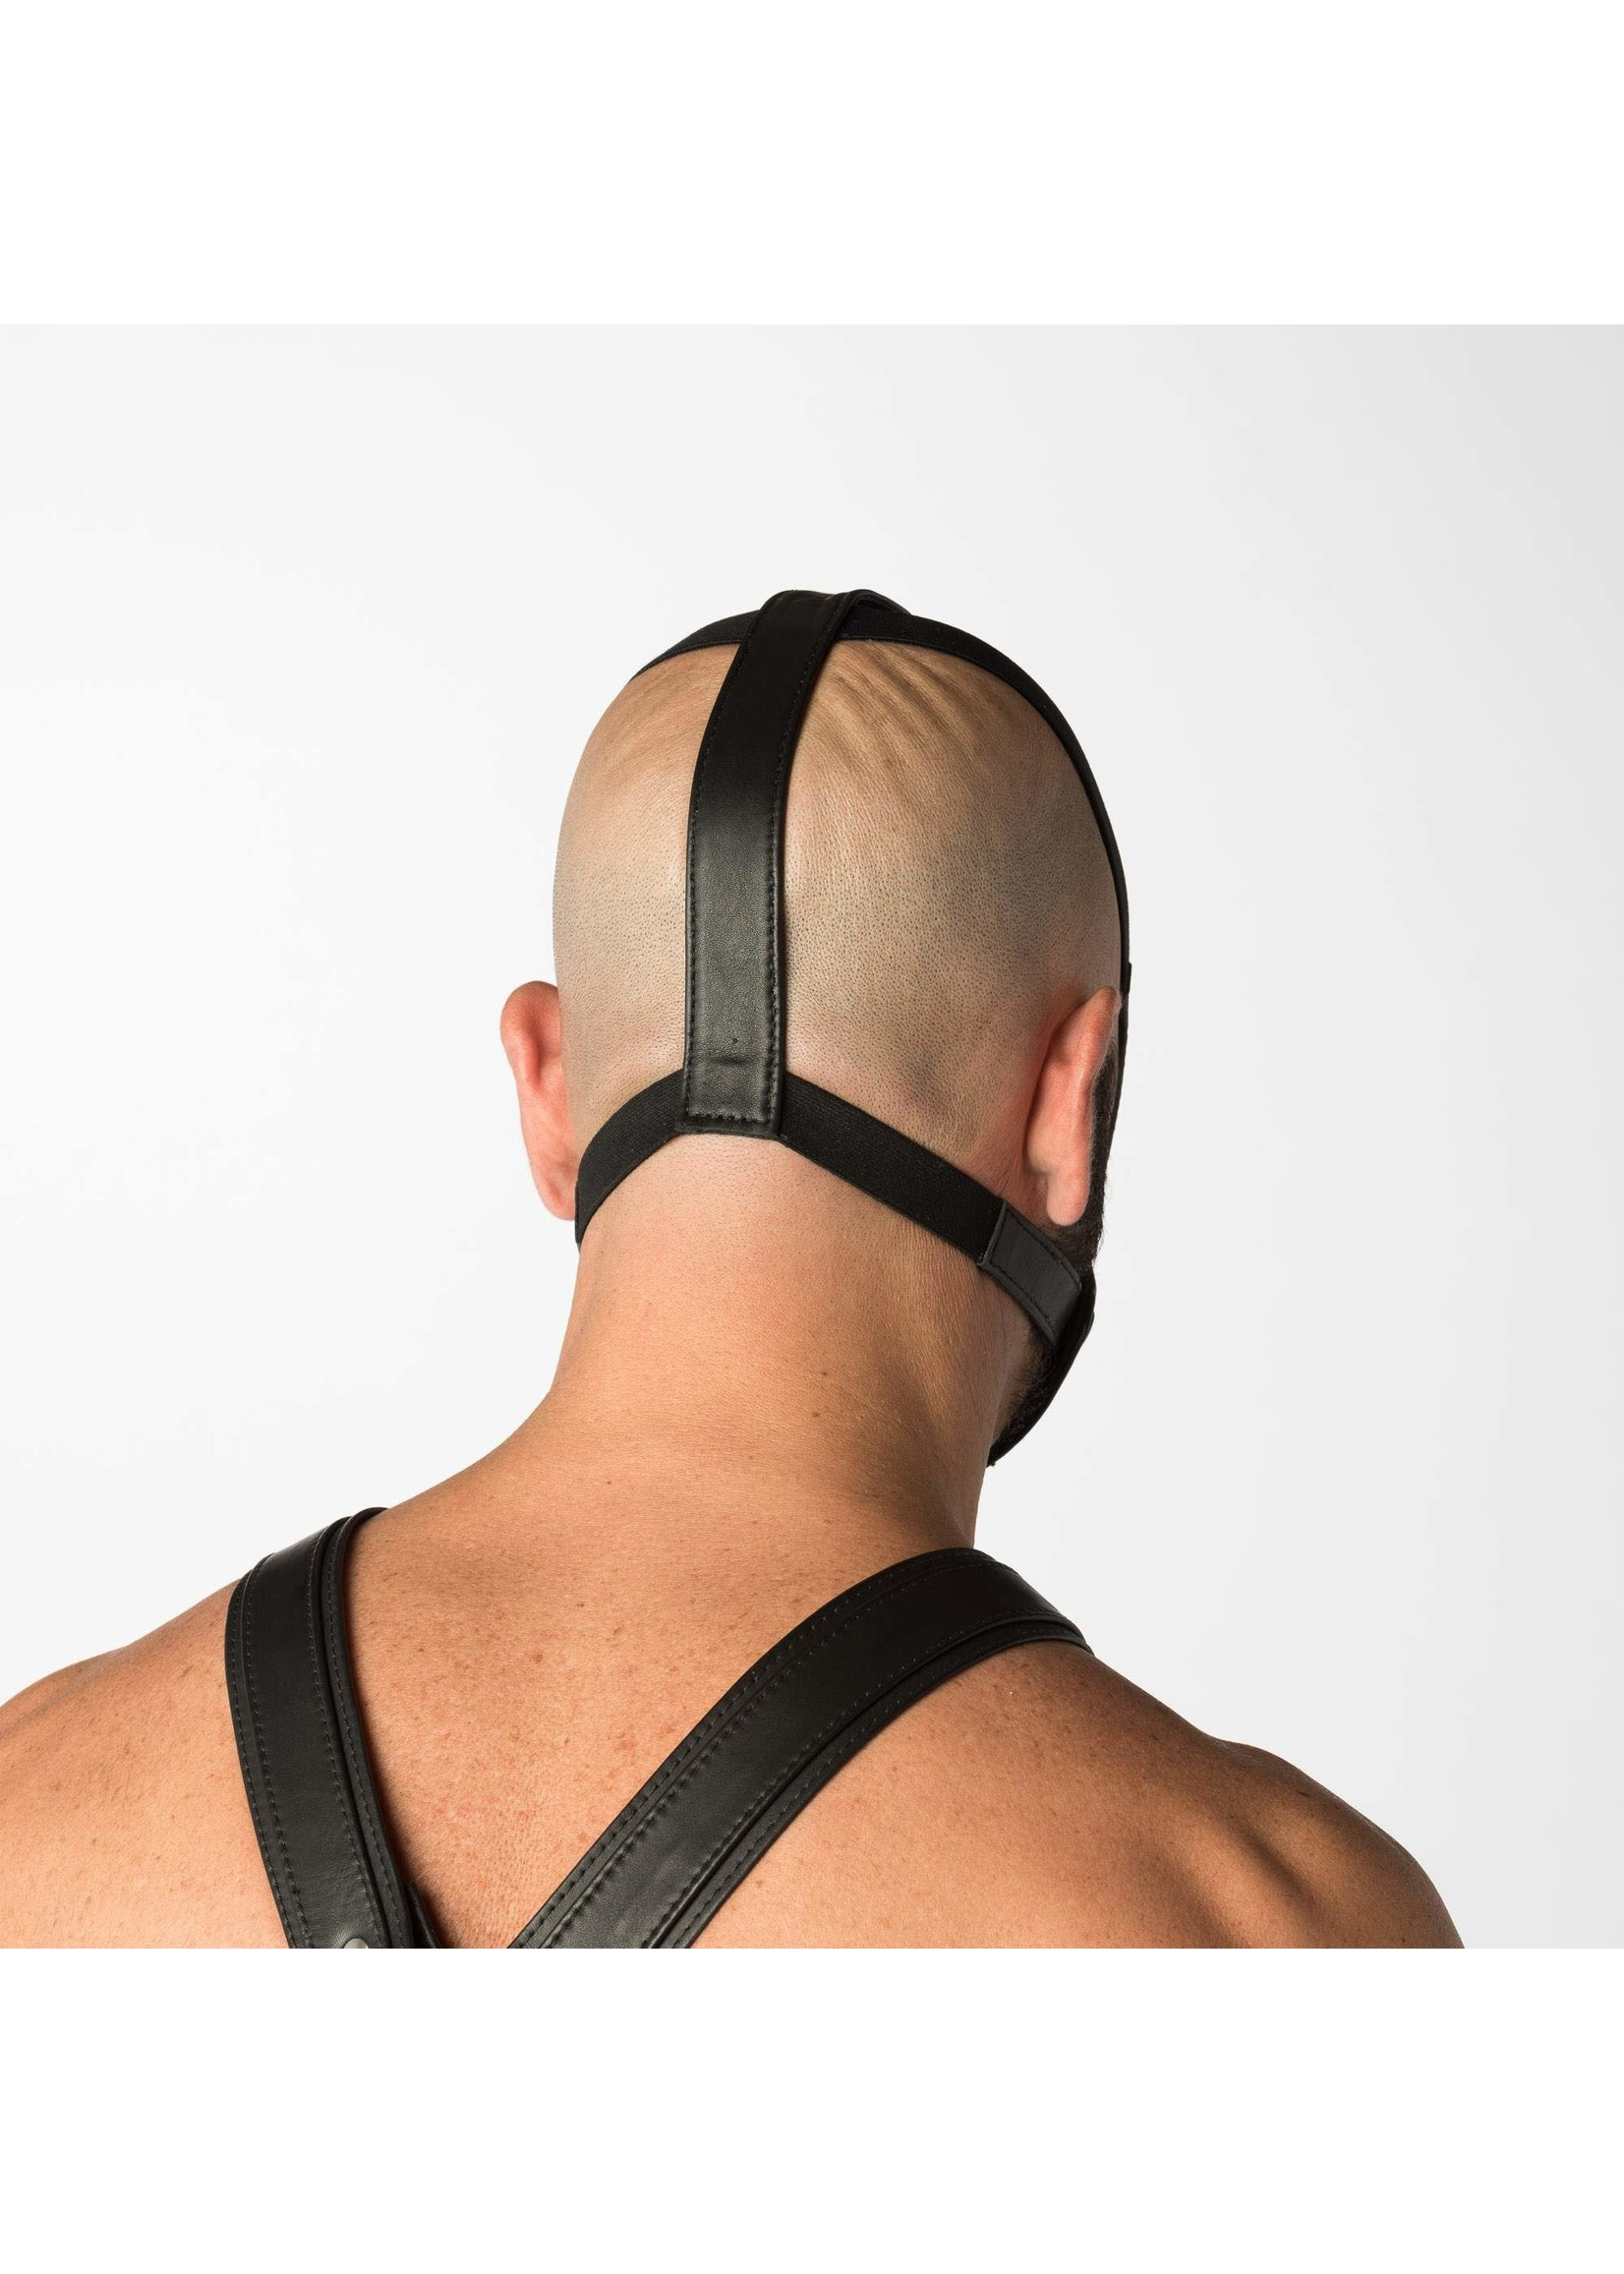 665 Leather 665 The Inhibitor Mask